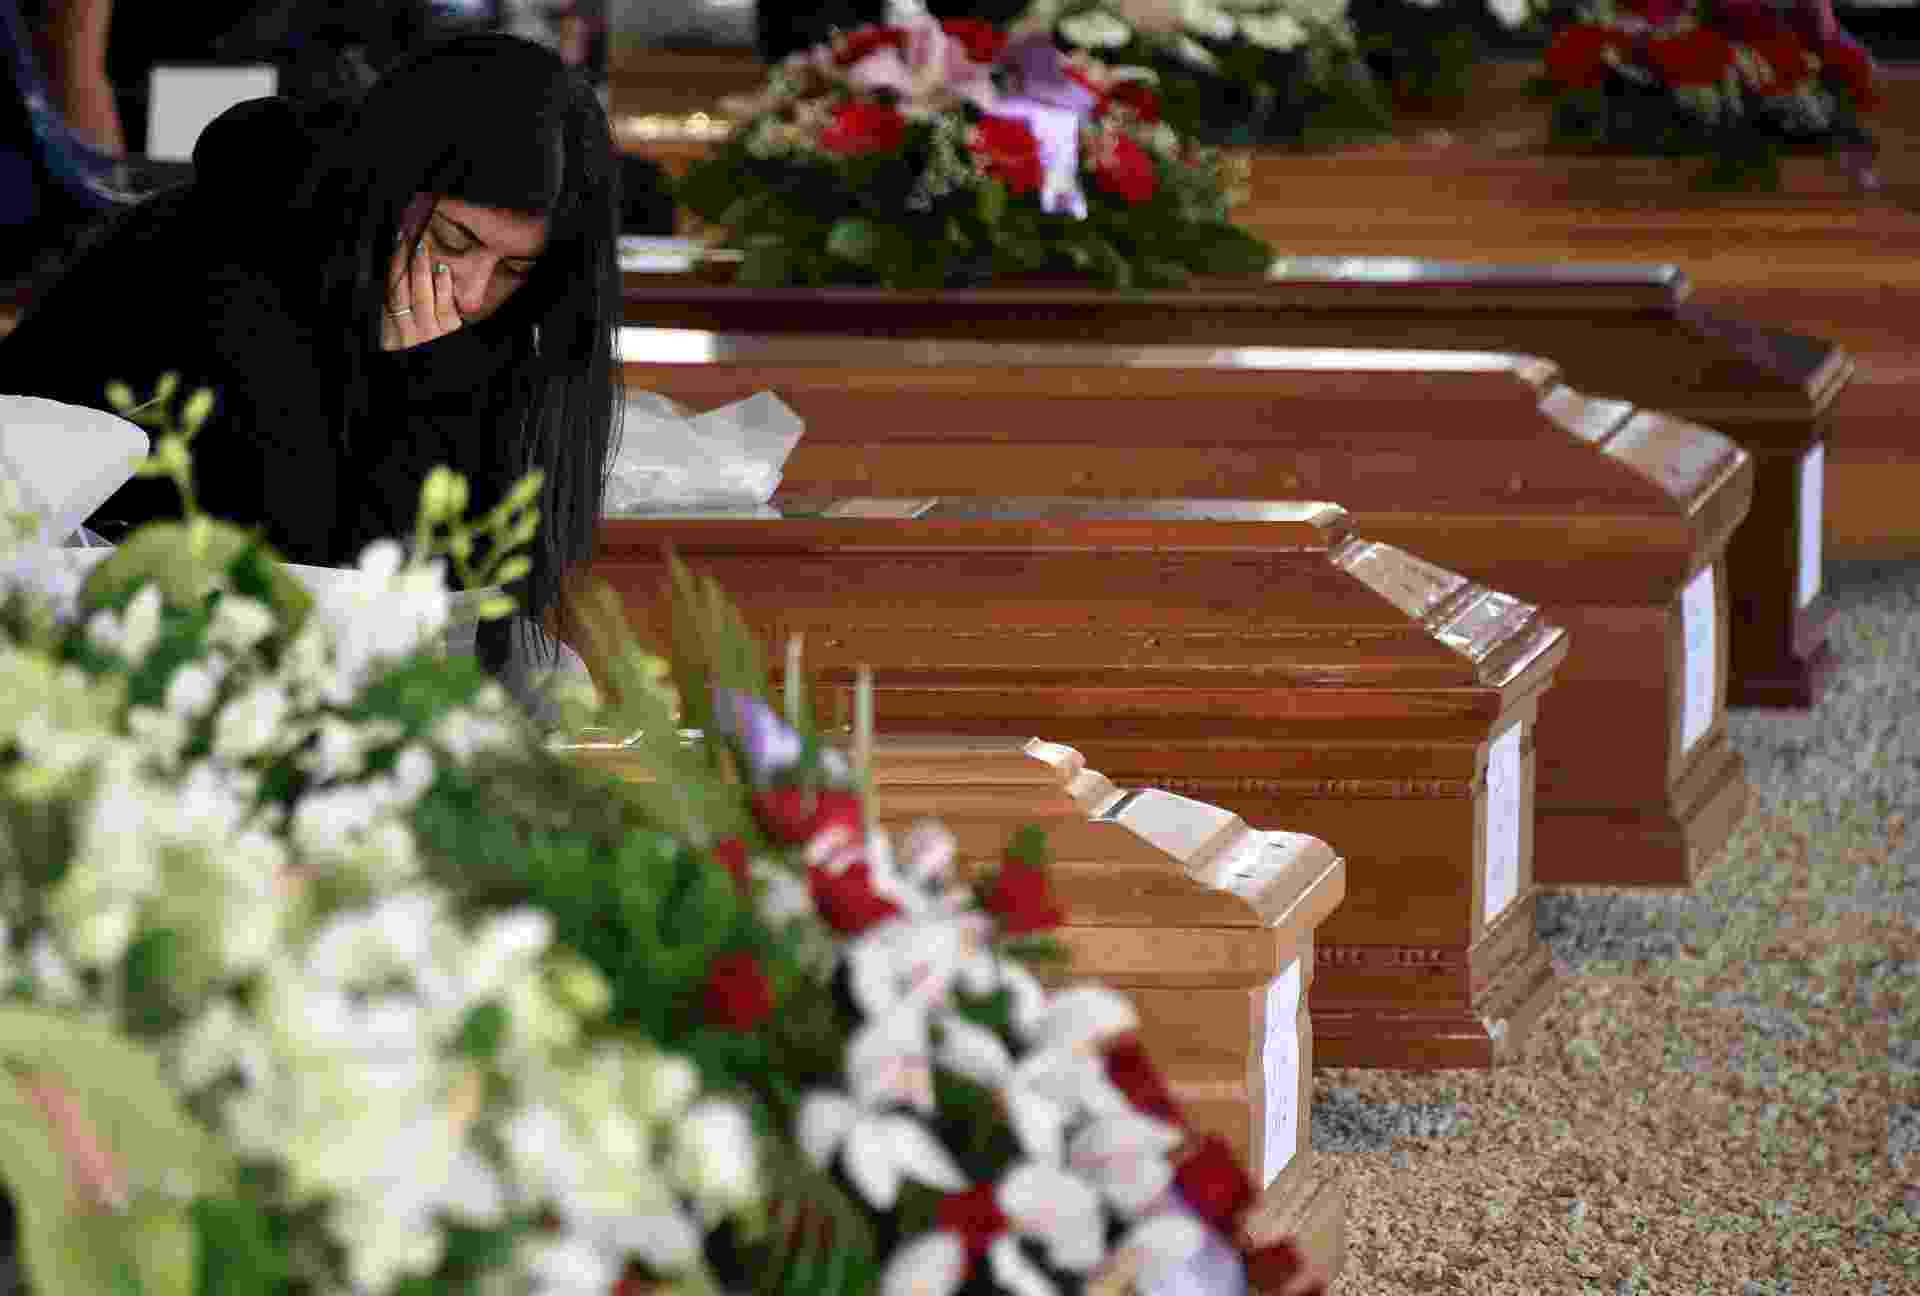 30.ago.2016 -  Mulher presta respeito a vítima durante funeral em Amatrice, Itália - Emiliano Grillotti/ Reuters